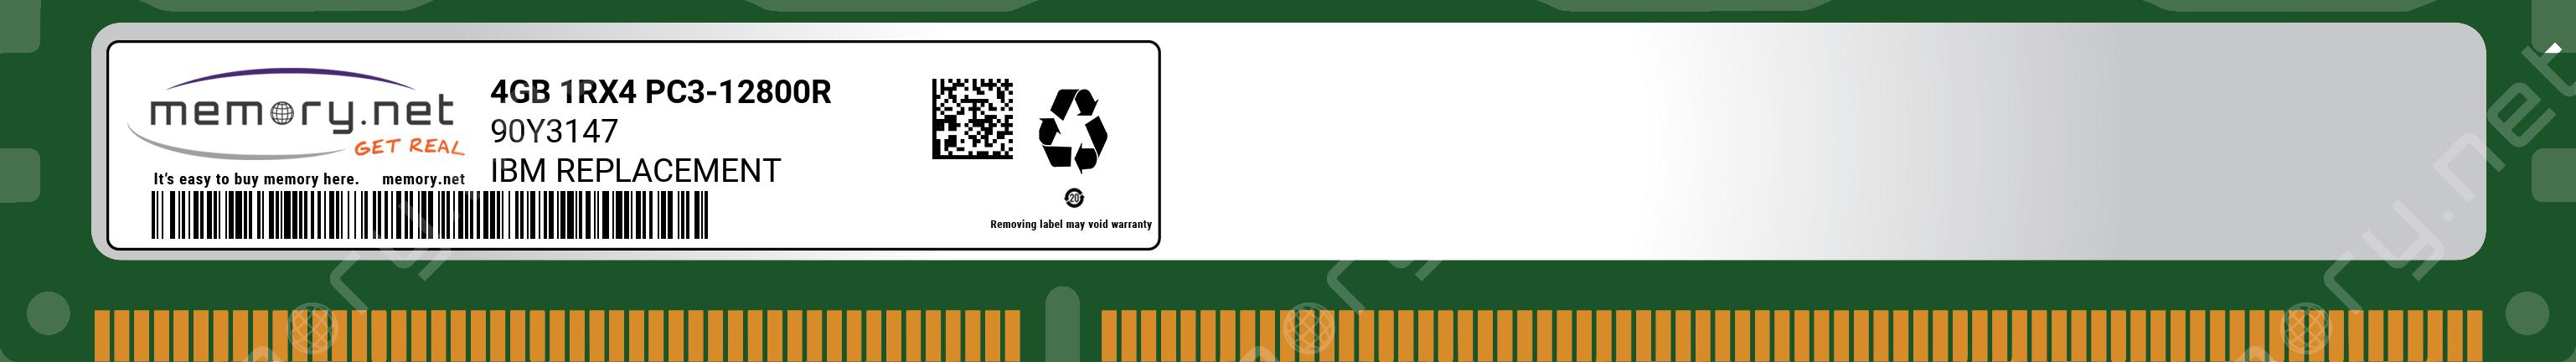 90Y3147